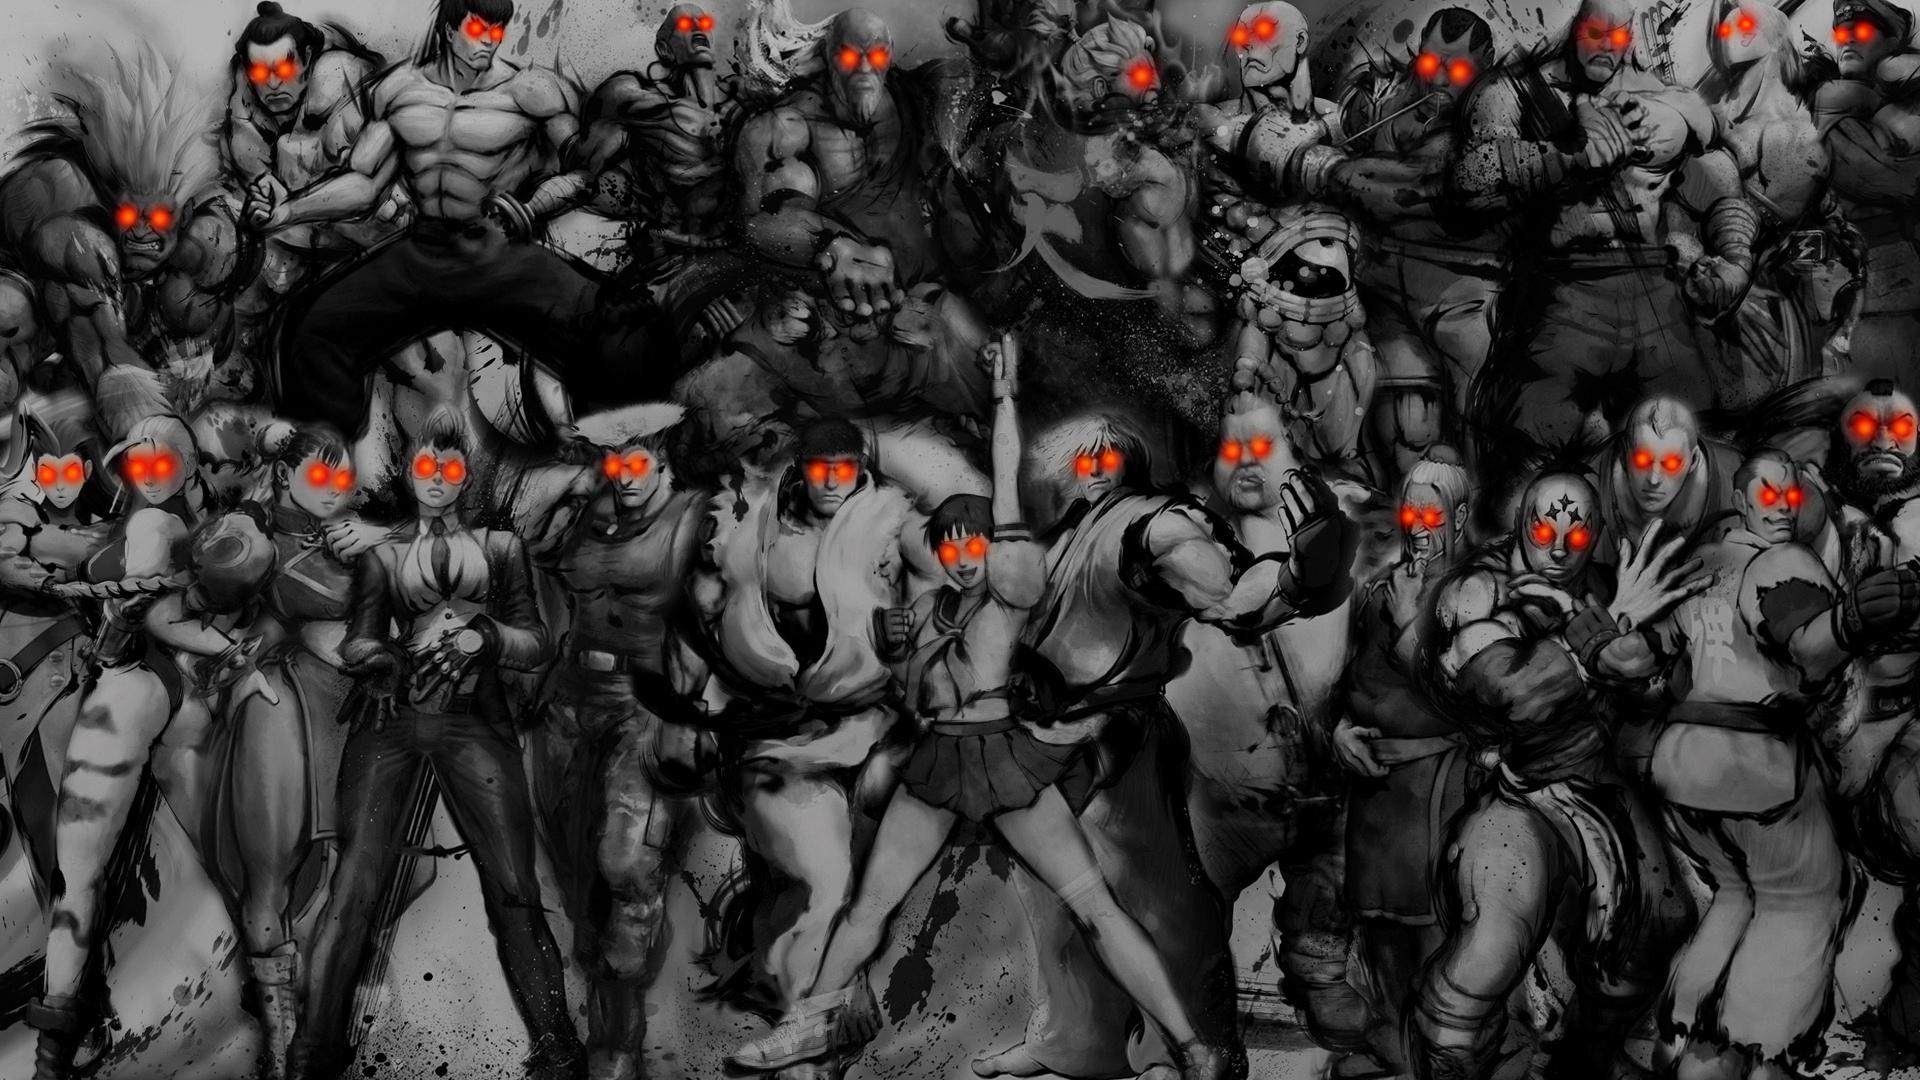 3d art wallpaper download